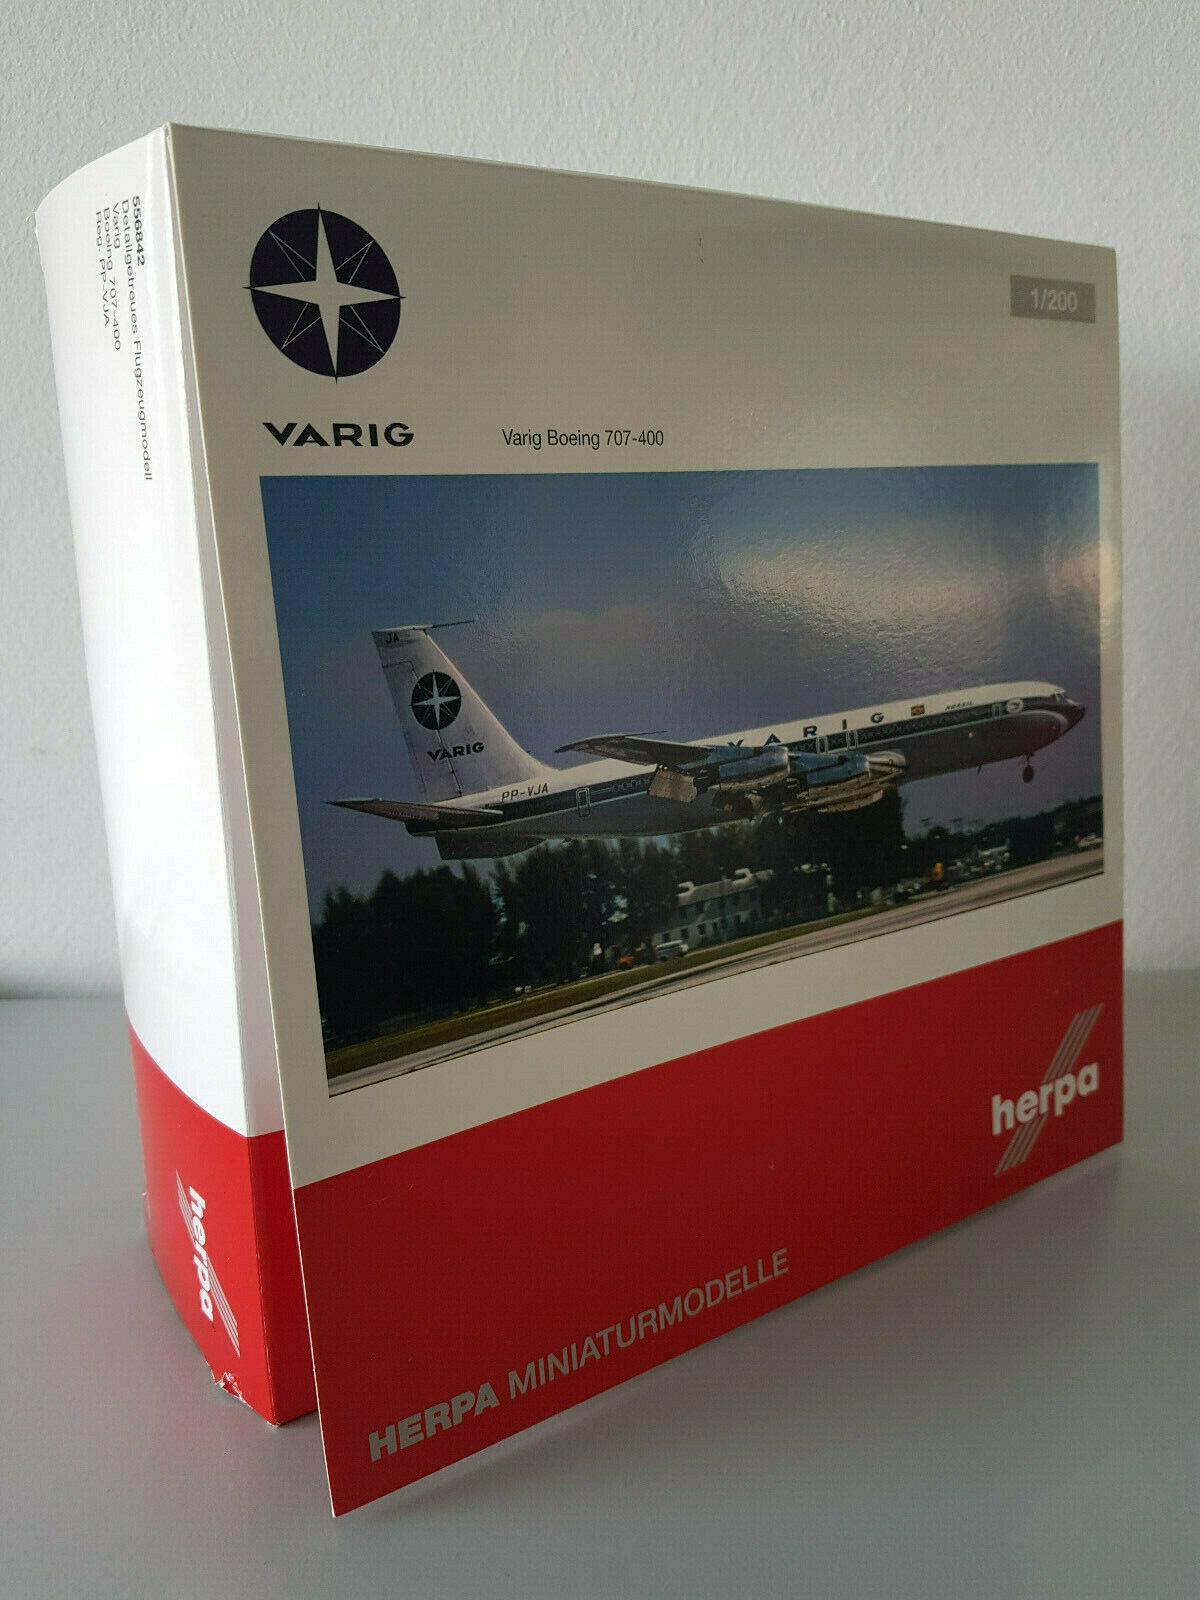 1 200 Herpa, 556842 Limited Varig Boeing 707-400 Registration PP-vja NEUF RARE